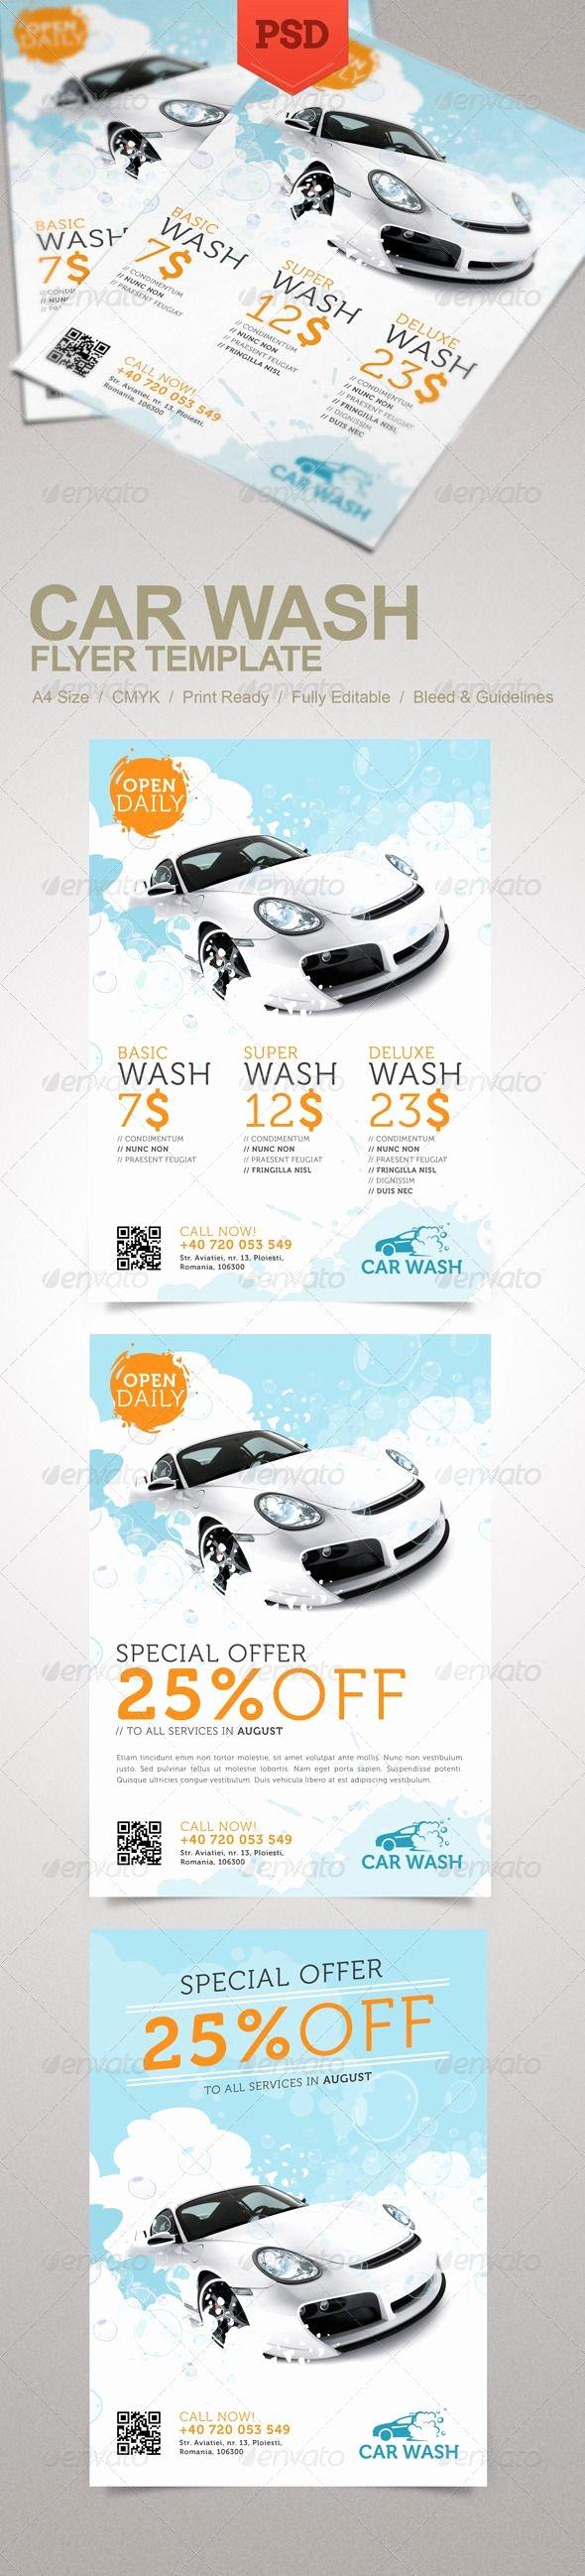 Car Wash Flyer Template Inspirational Car Wash Flyer